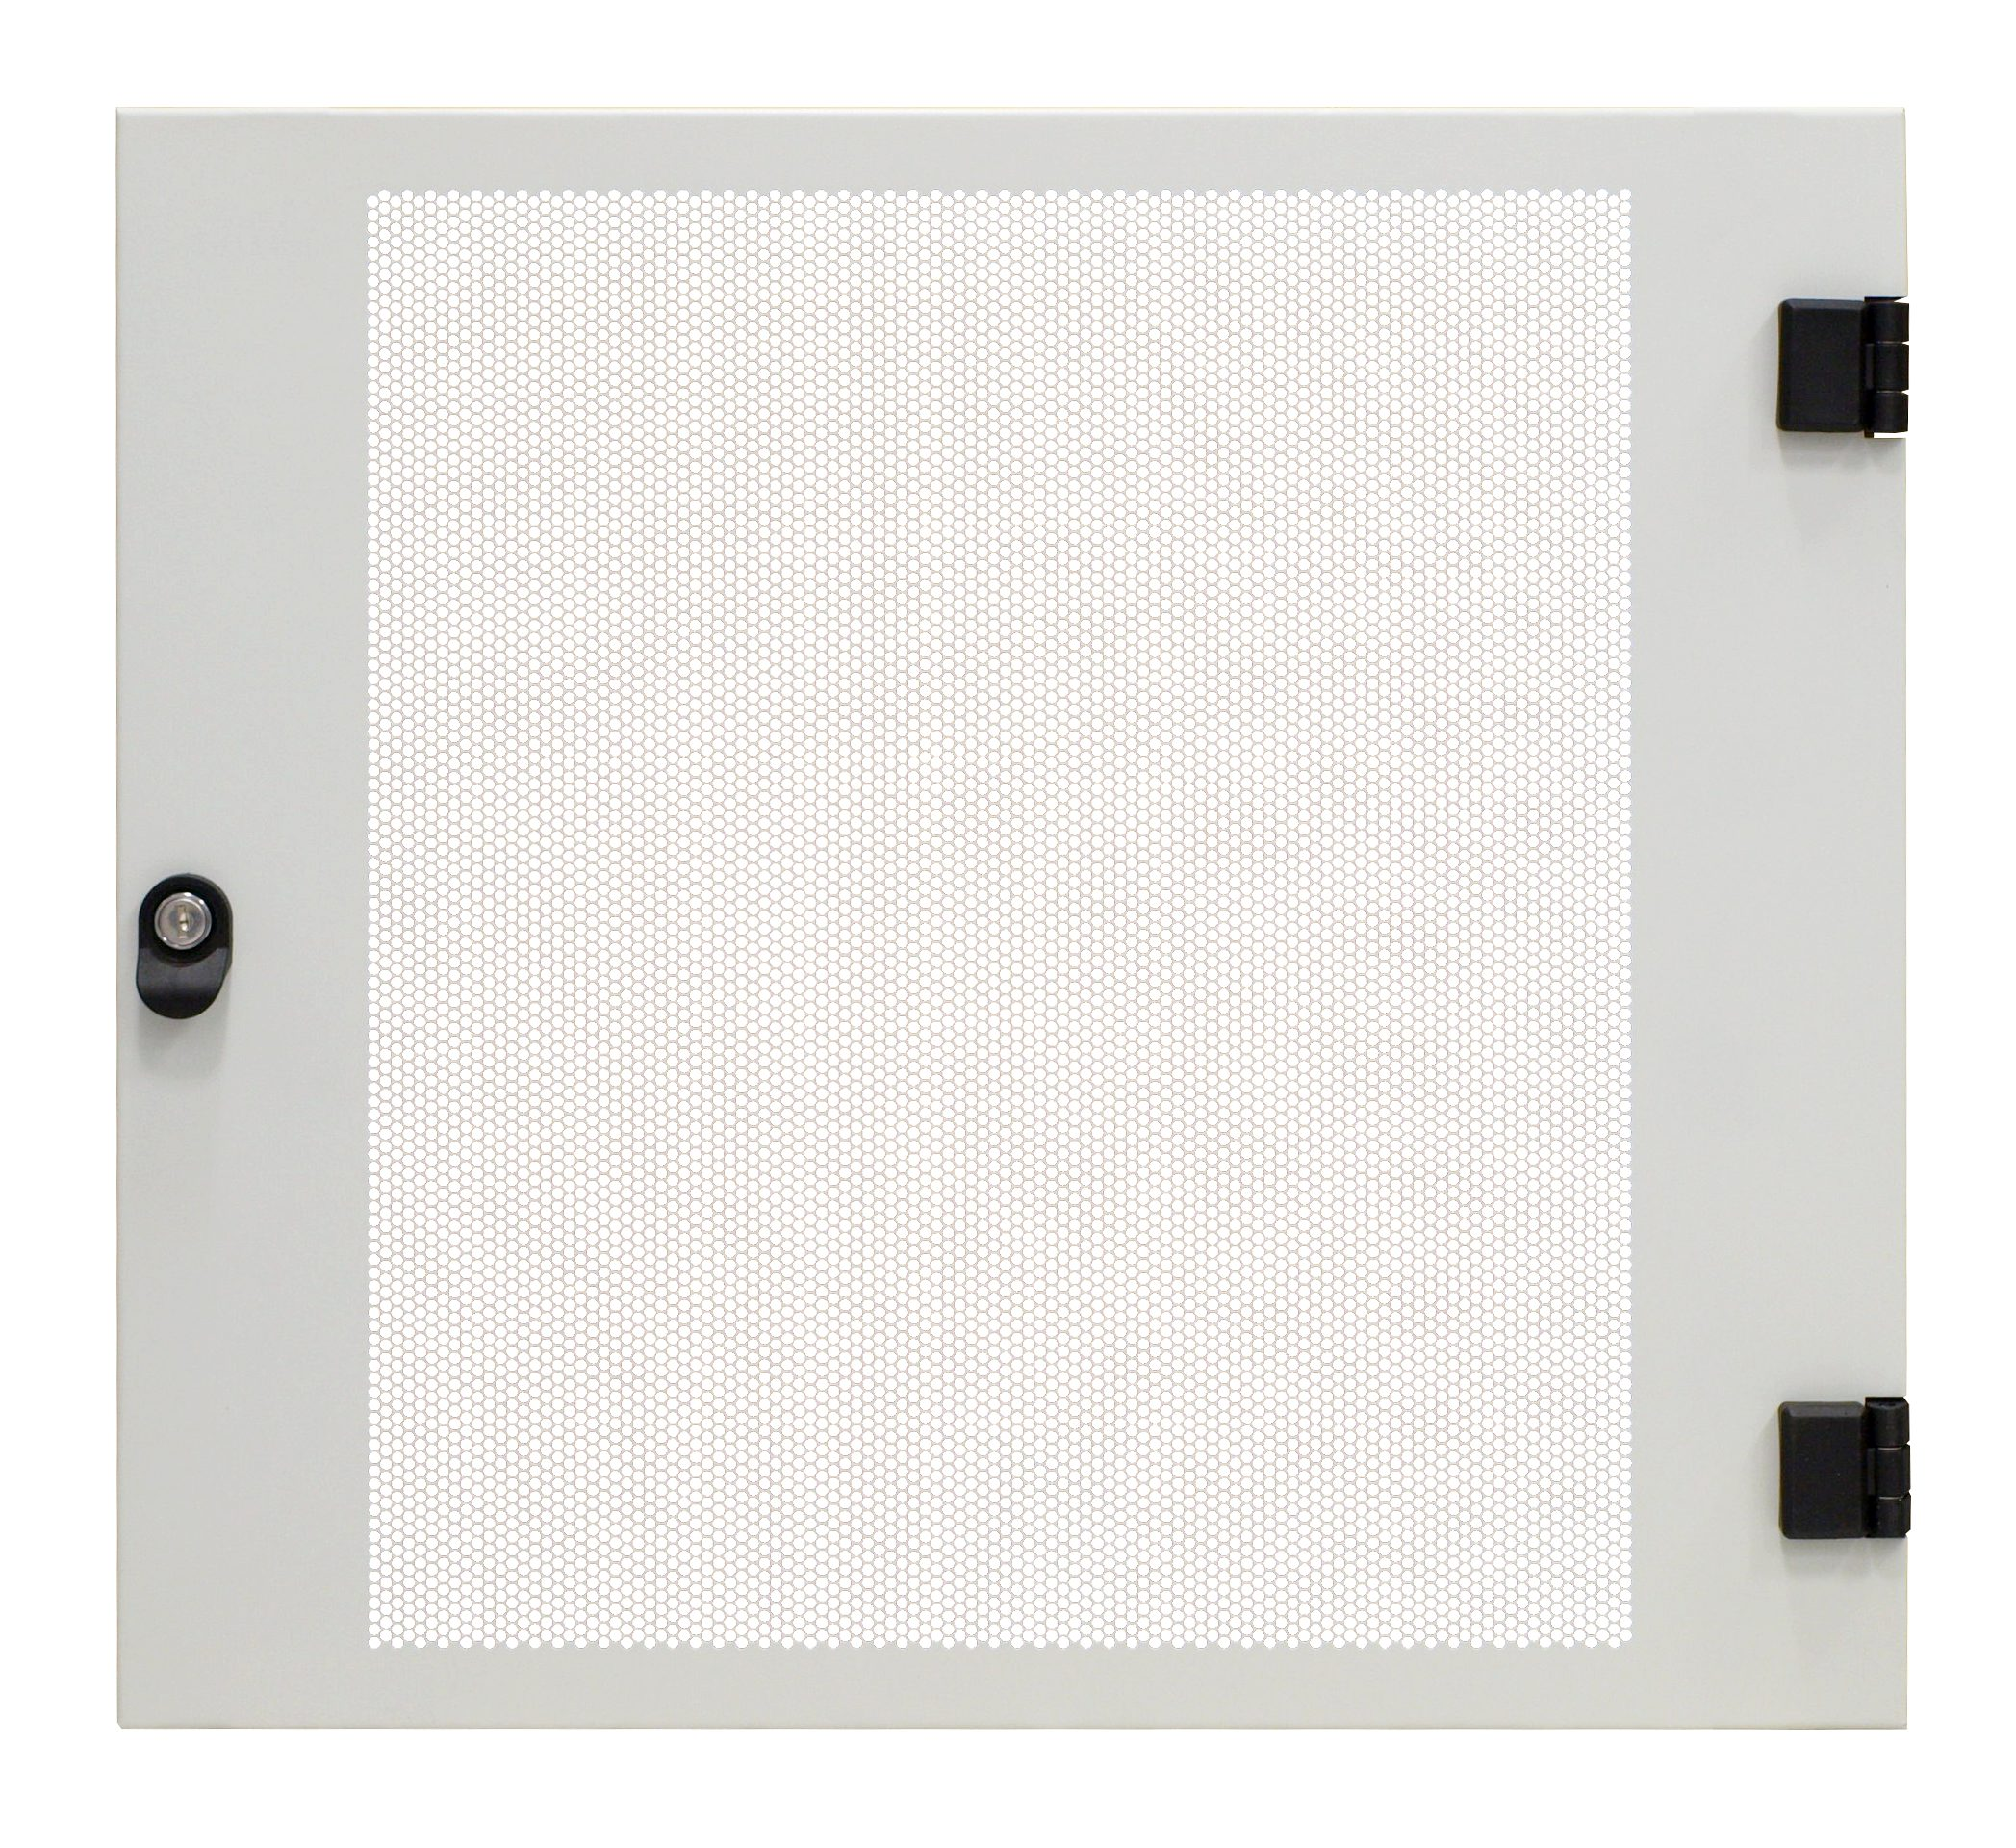 1 Stk Metall-Tür perforiert 80% f. DW-Schrank 15HE, B=600, RAL7035 DWRT1561--